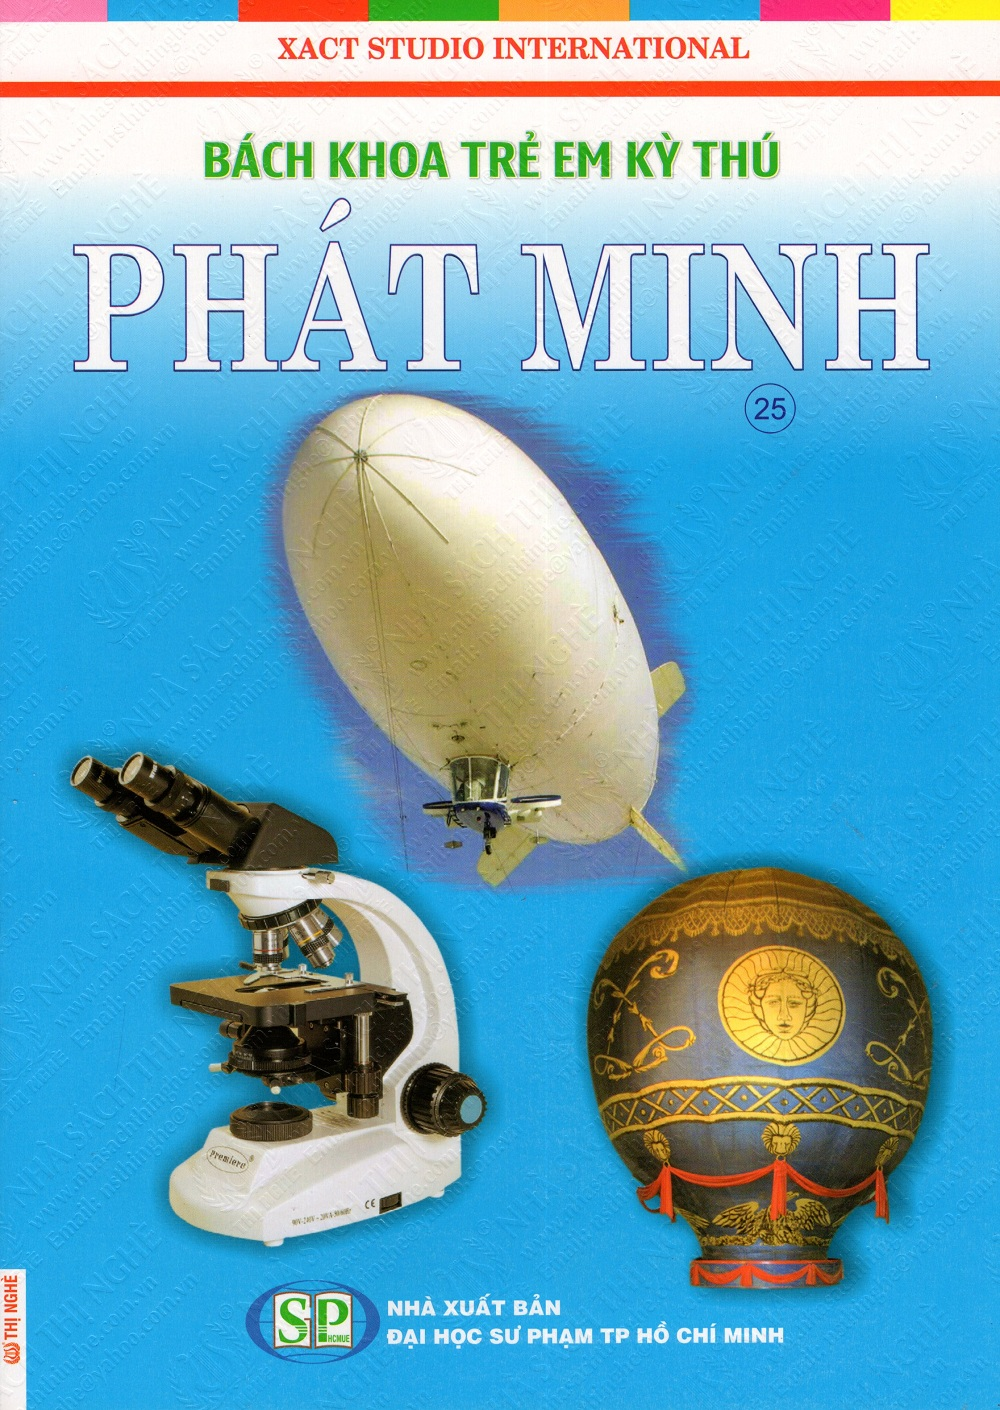 Bìa sách Bách Khoa Trẻ Em Kỳ Thú - Phát Minh (25)